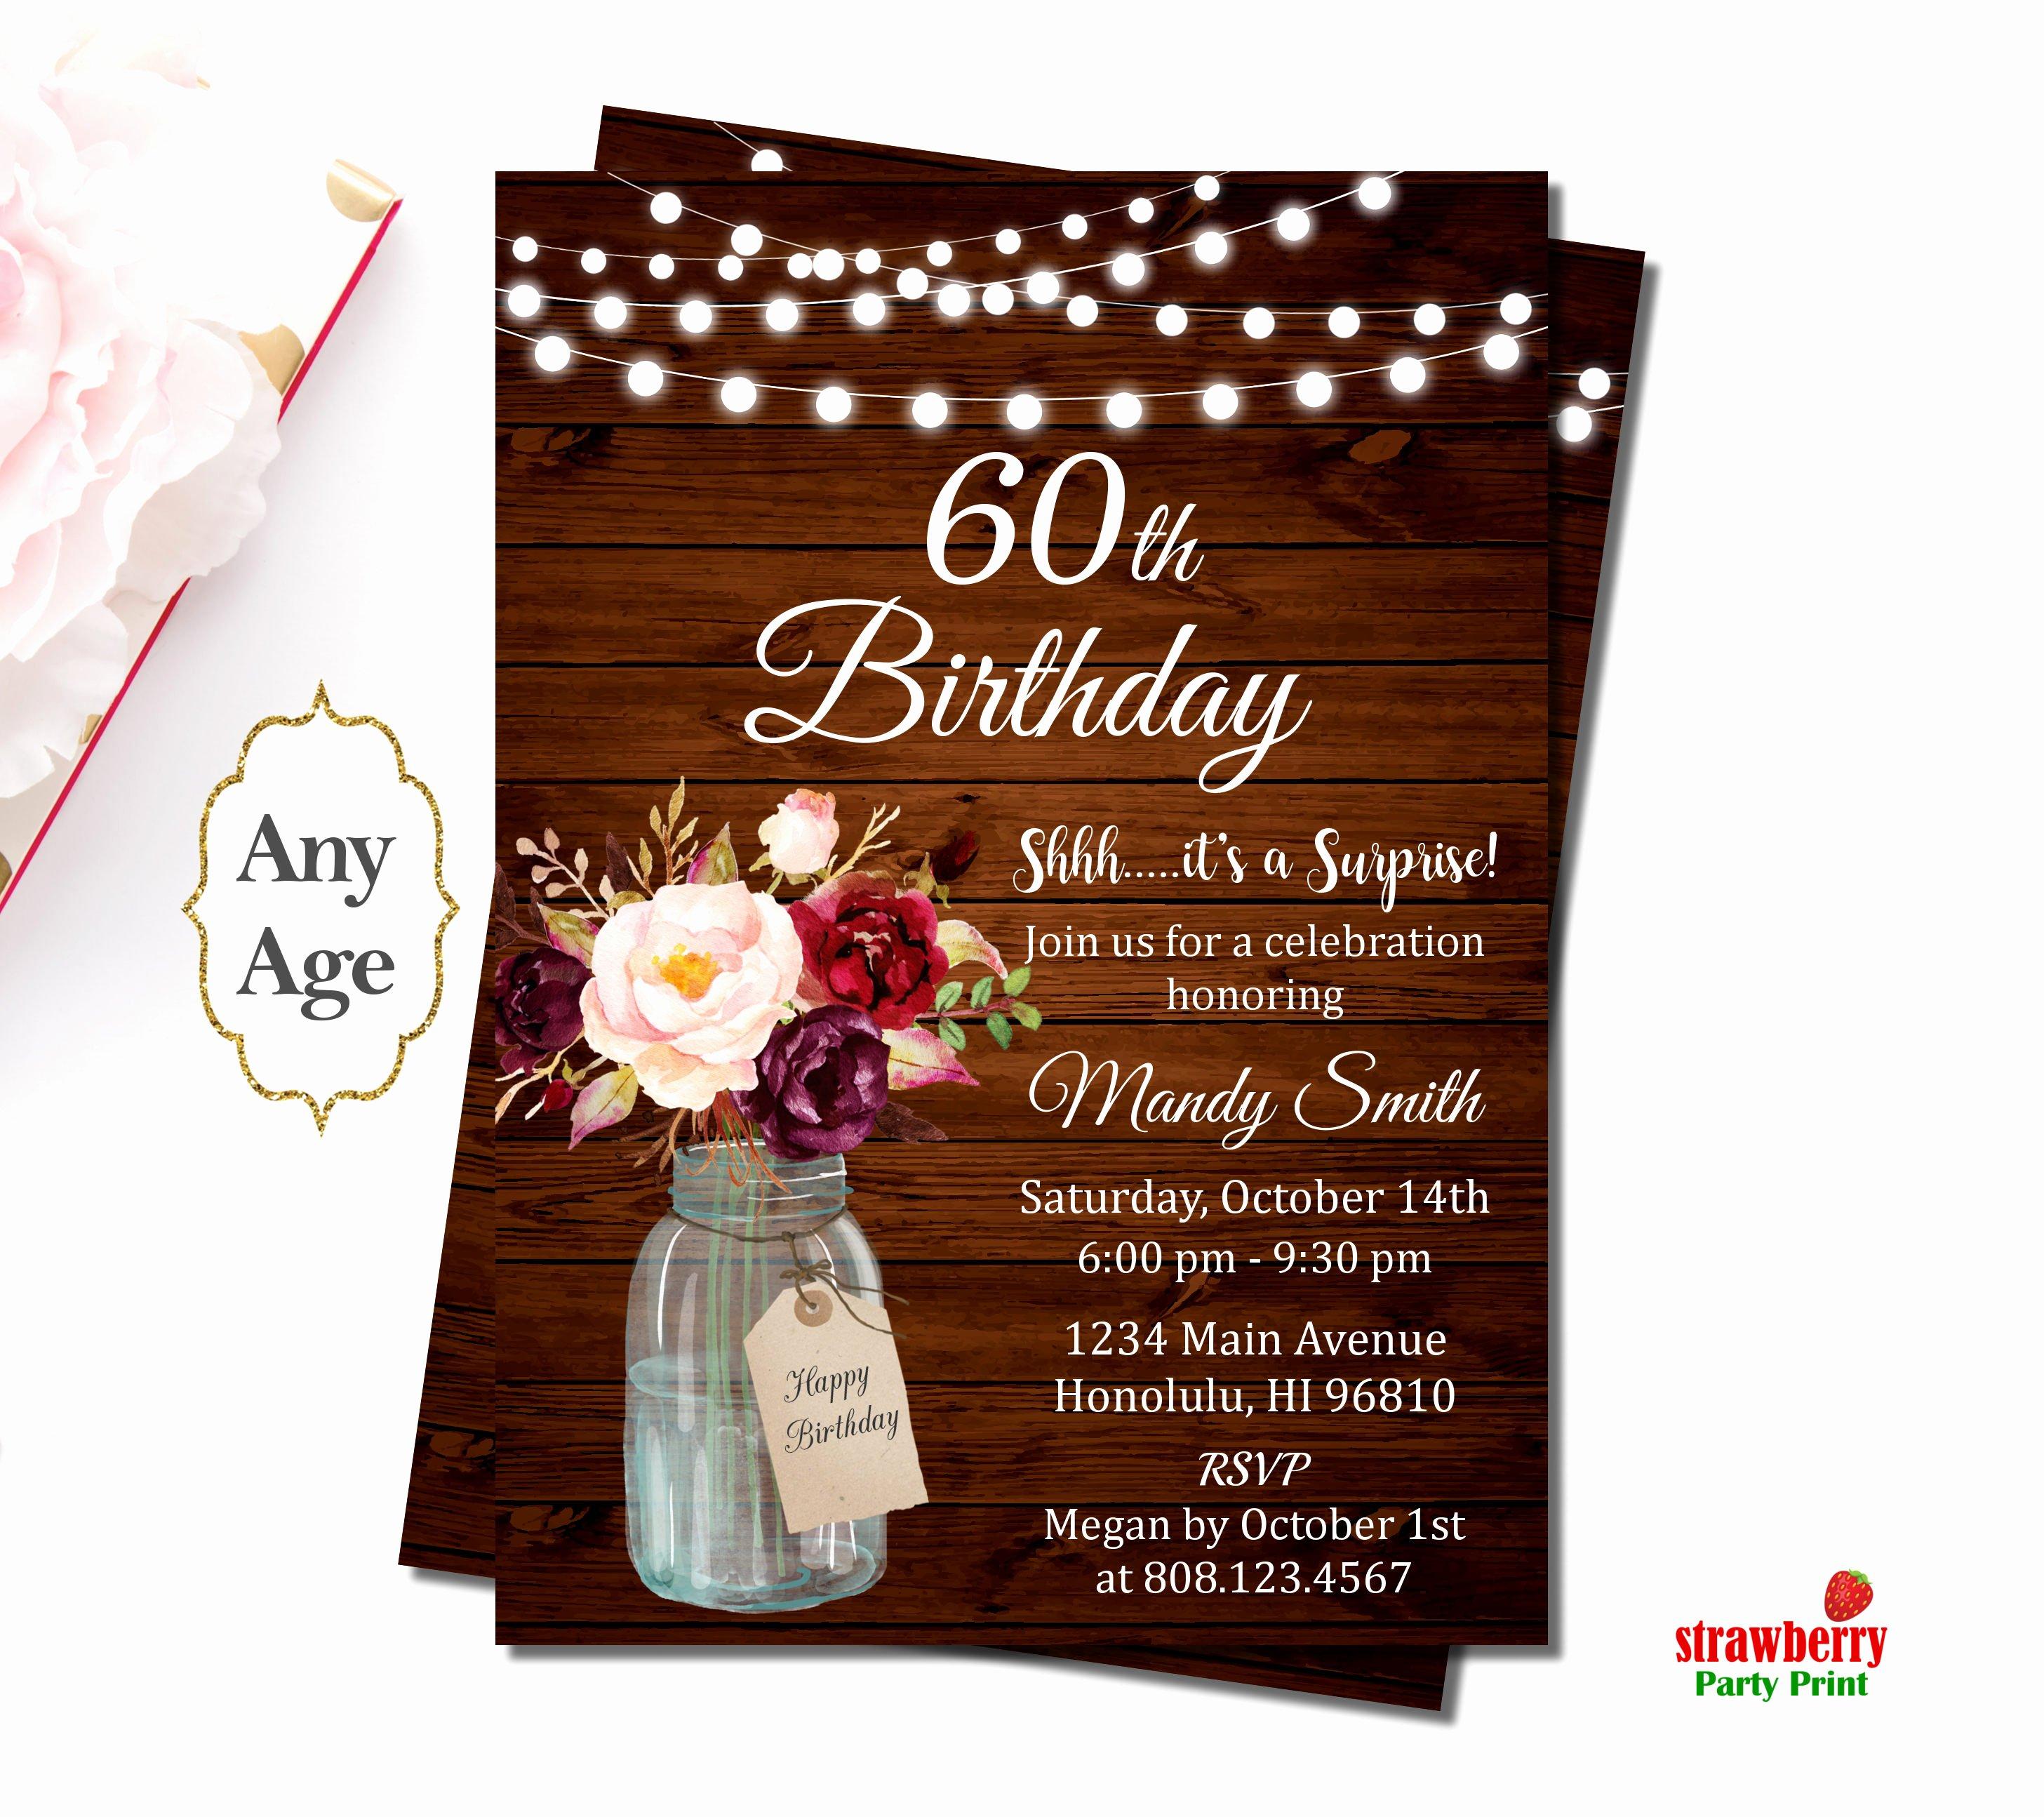 60 Th Birthday Invitation Unique 60th Birthday Invitations for Women Surprise 60th Birthday